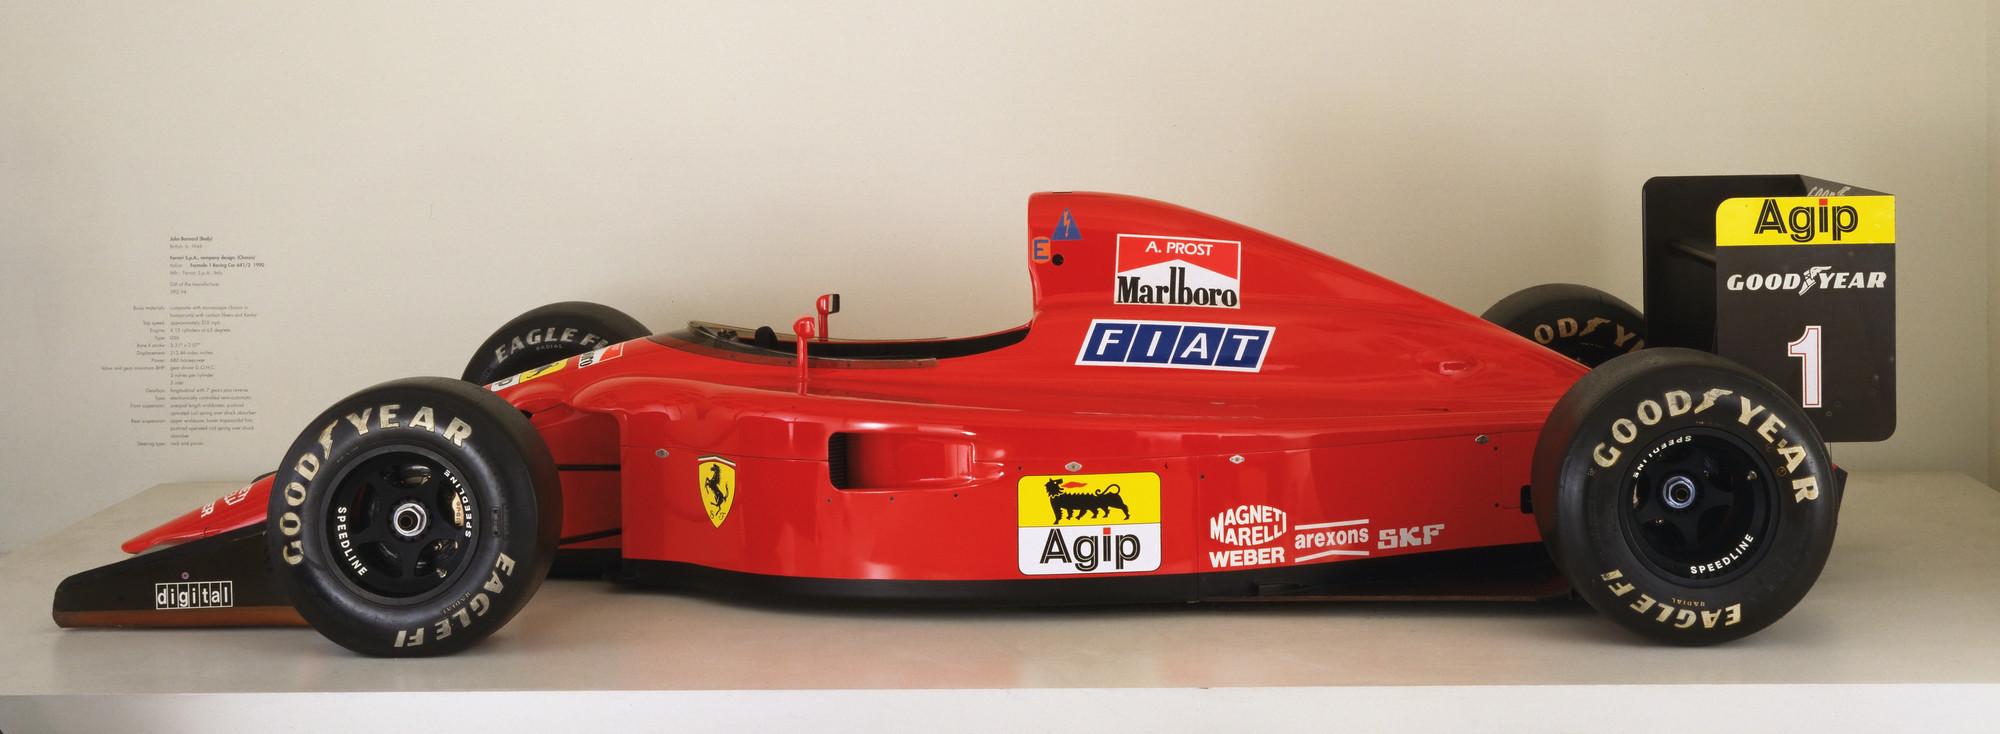 John Barnard, Ferrari S.p.A., Maranello, Italy Formula 1 Racing Car (641/2)  1990